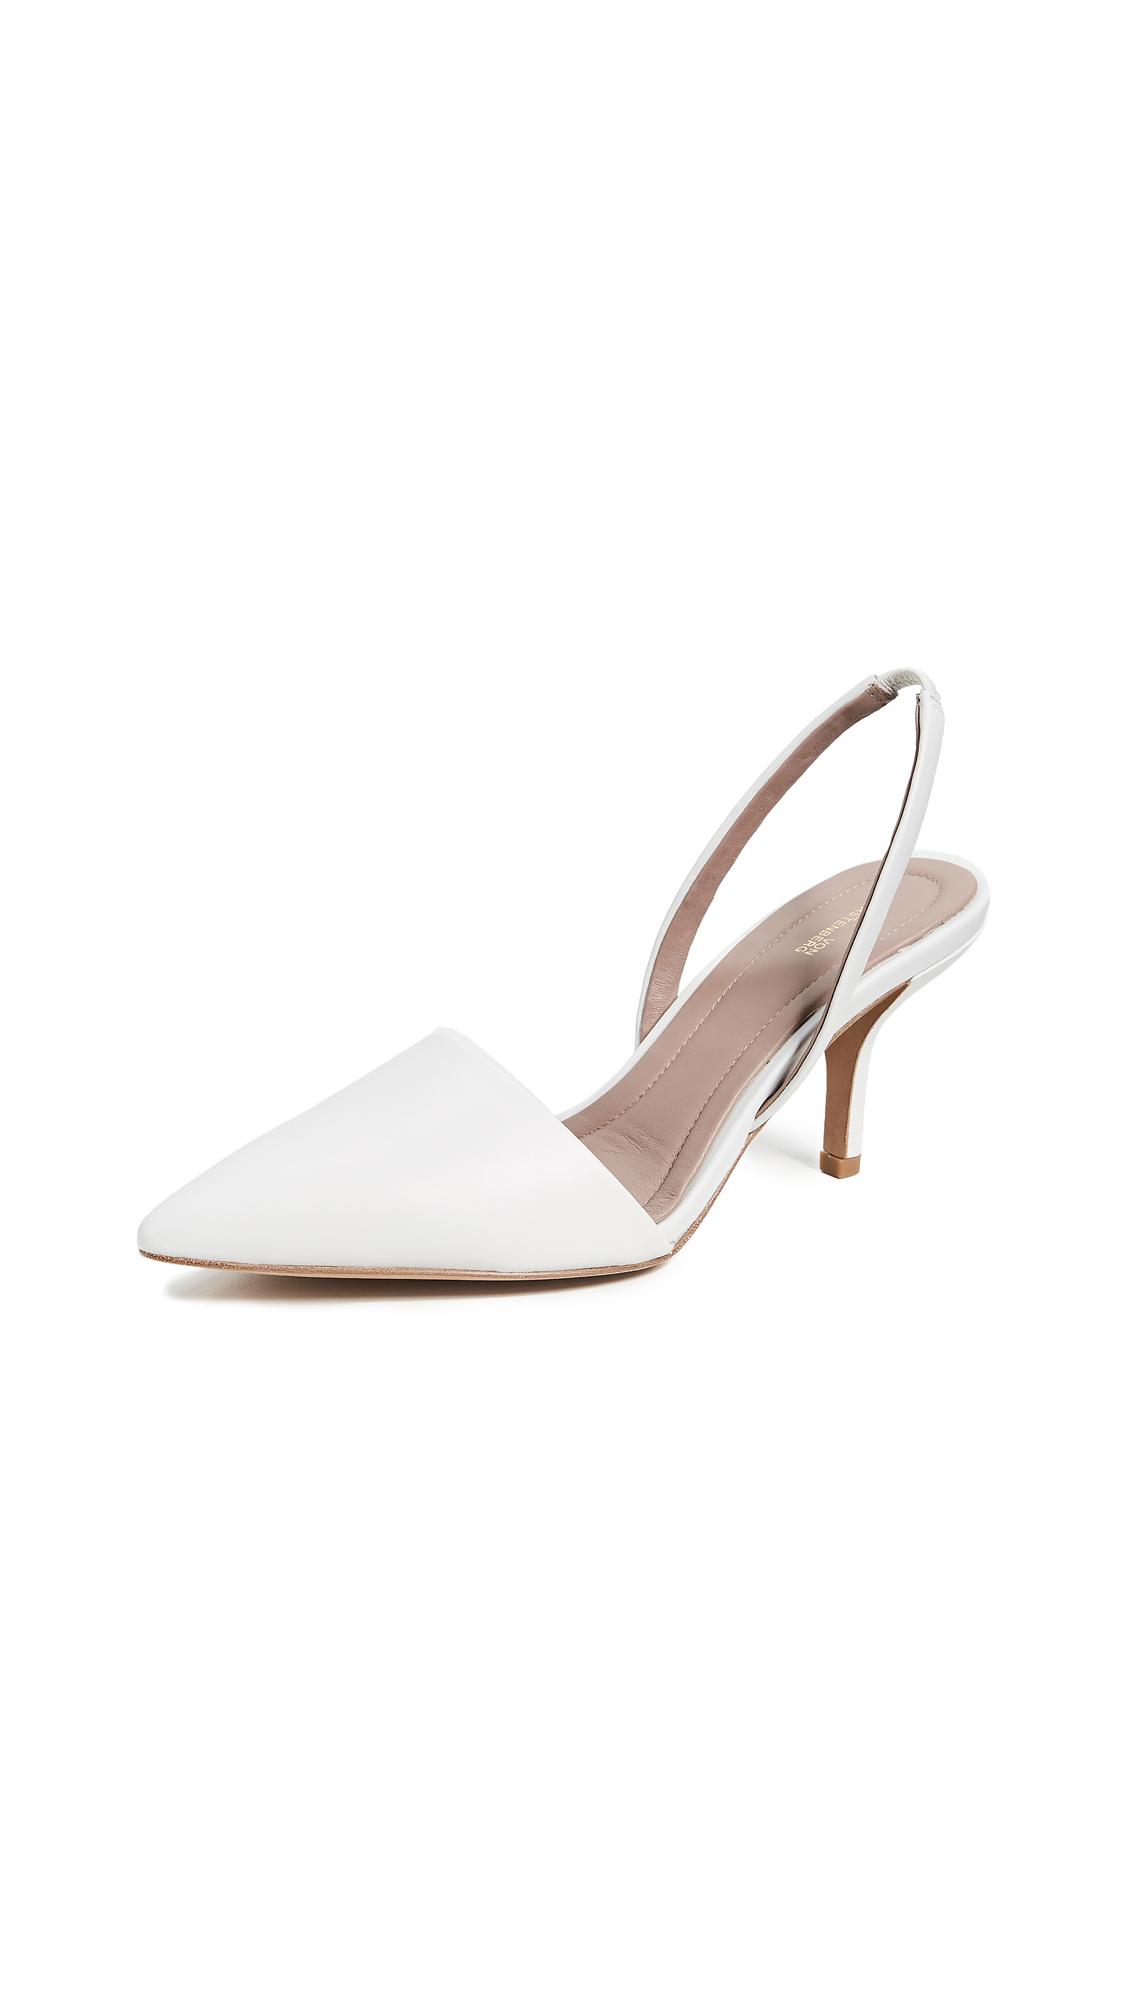 Diane von Furstenberg Mortelle Slingback Pumps - White